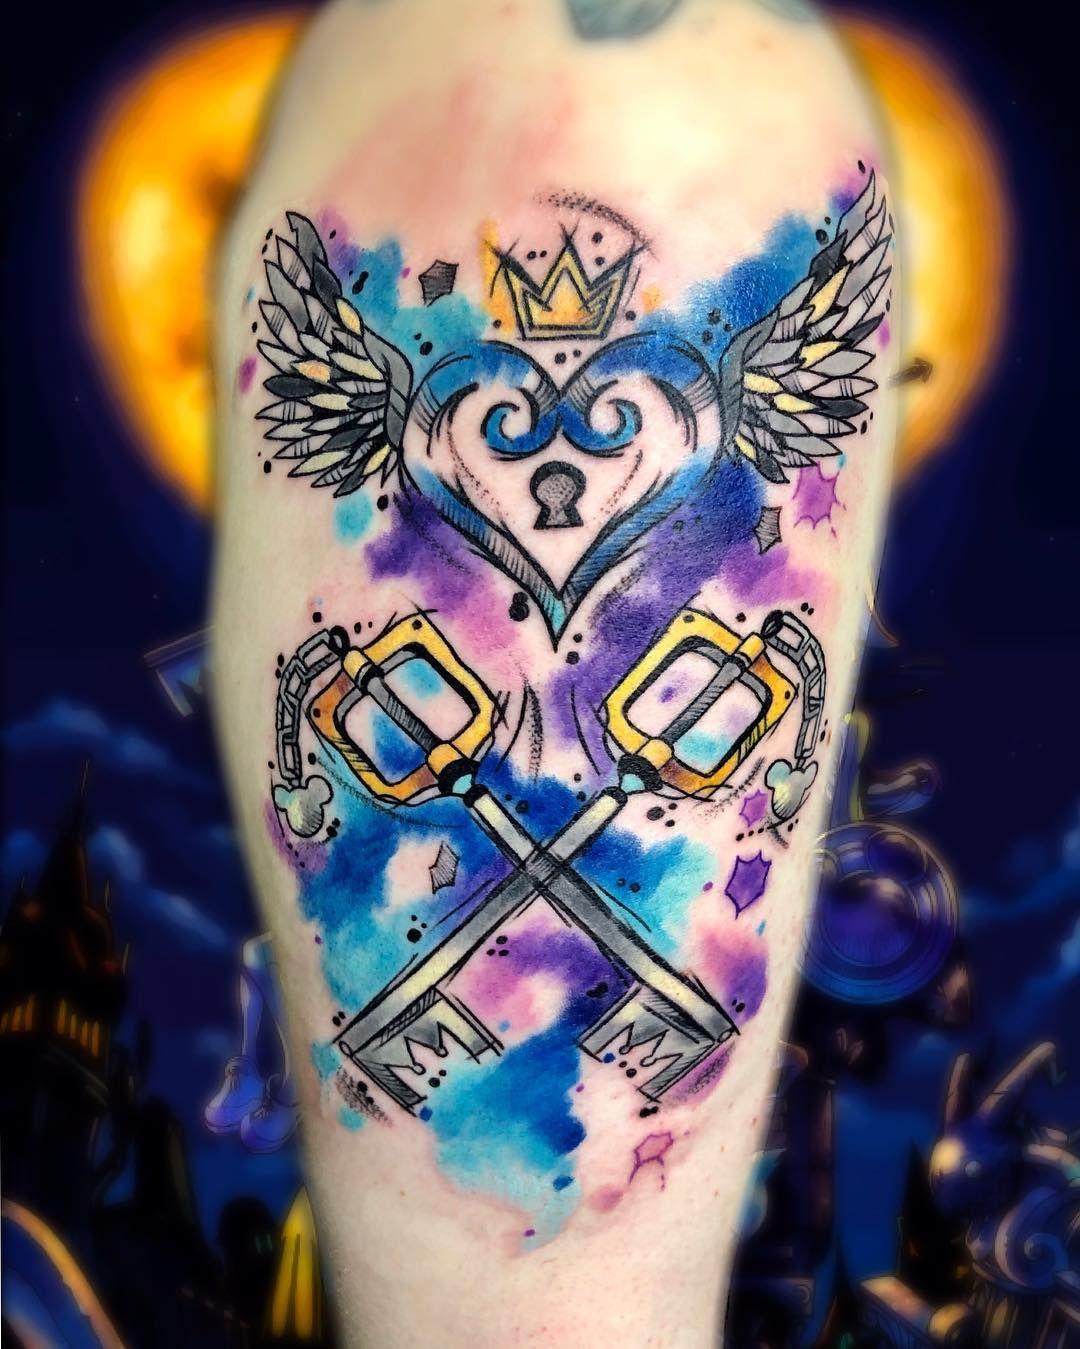 Small Simple Bioshock Tattoo Designs (31)